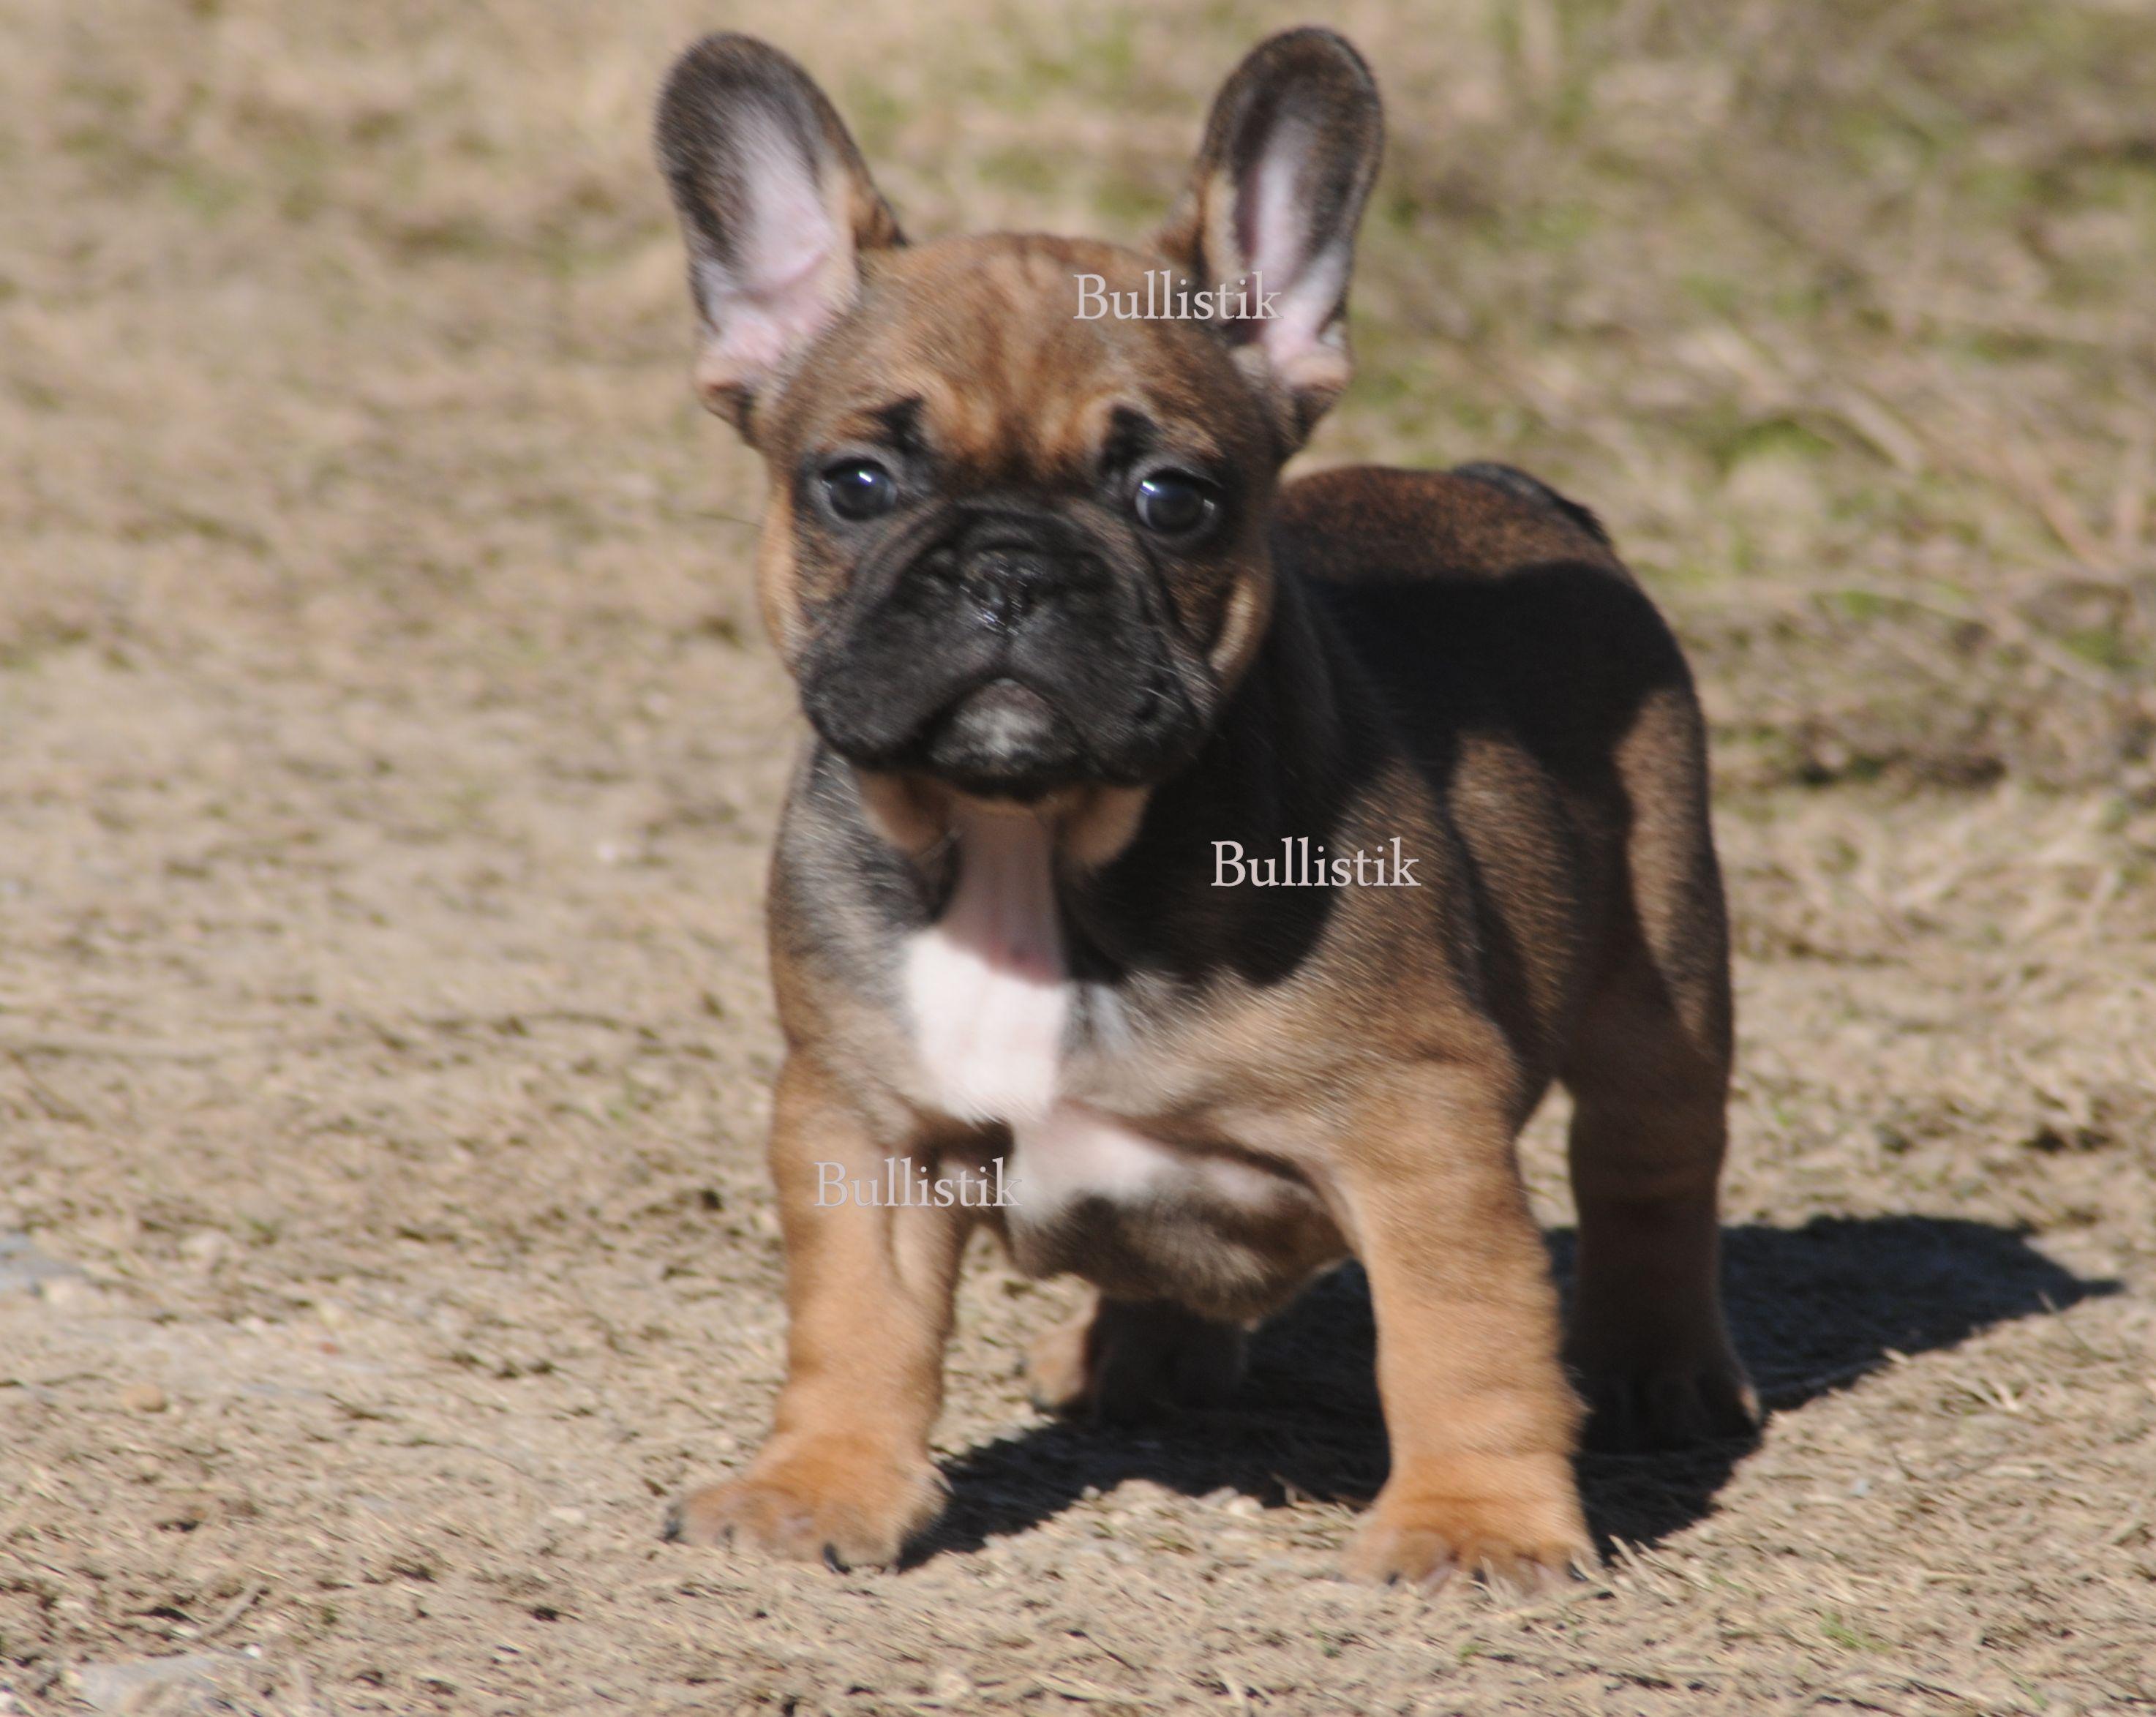 Tycoon Blue French Bulldogs By Bullistik